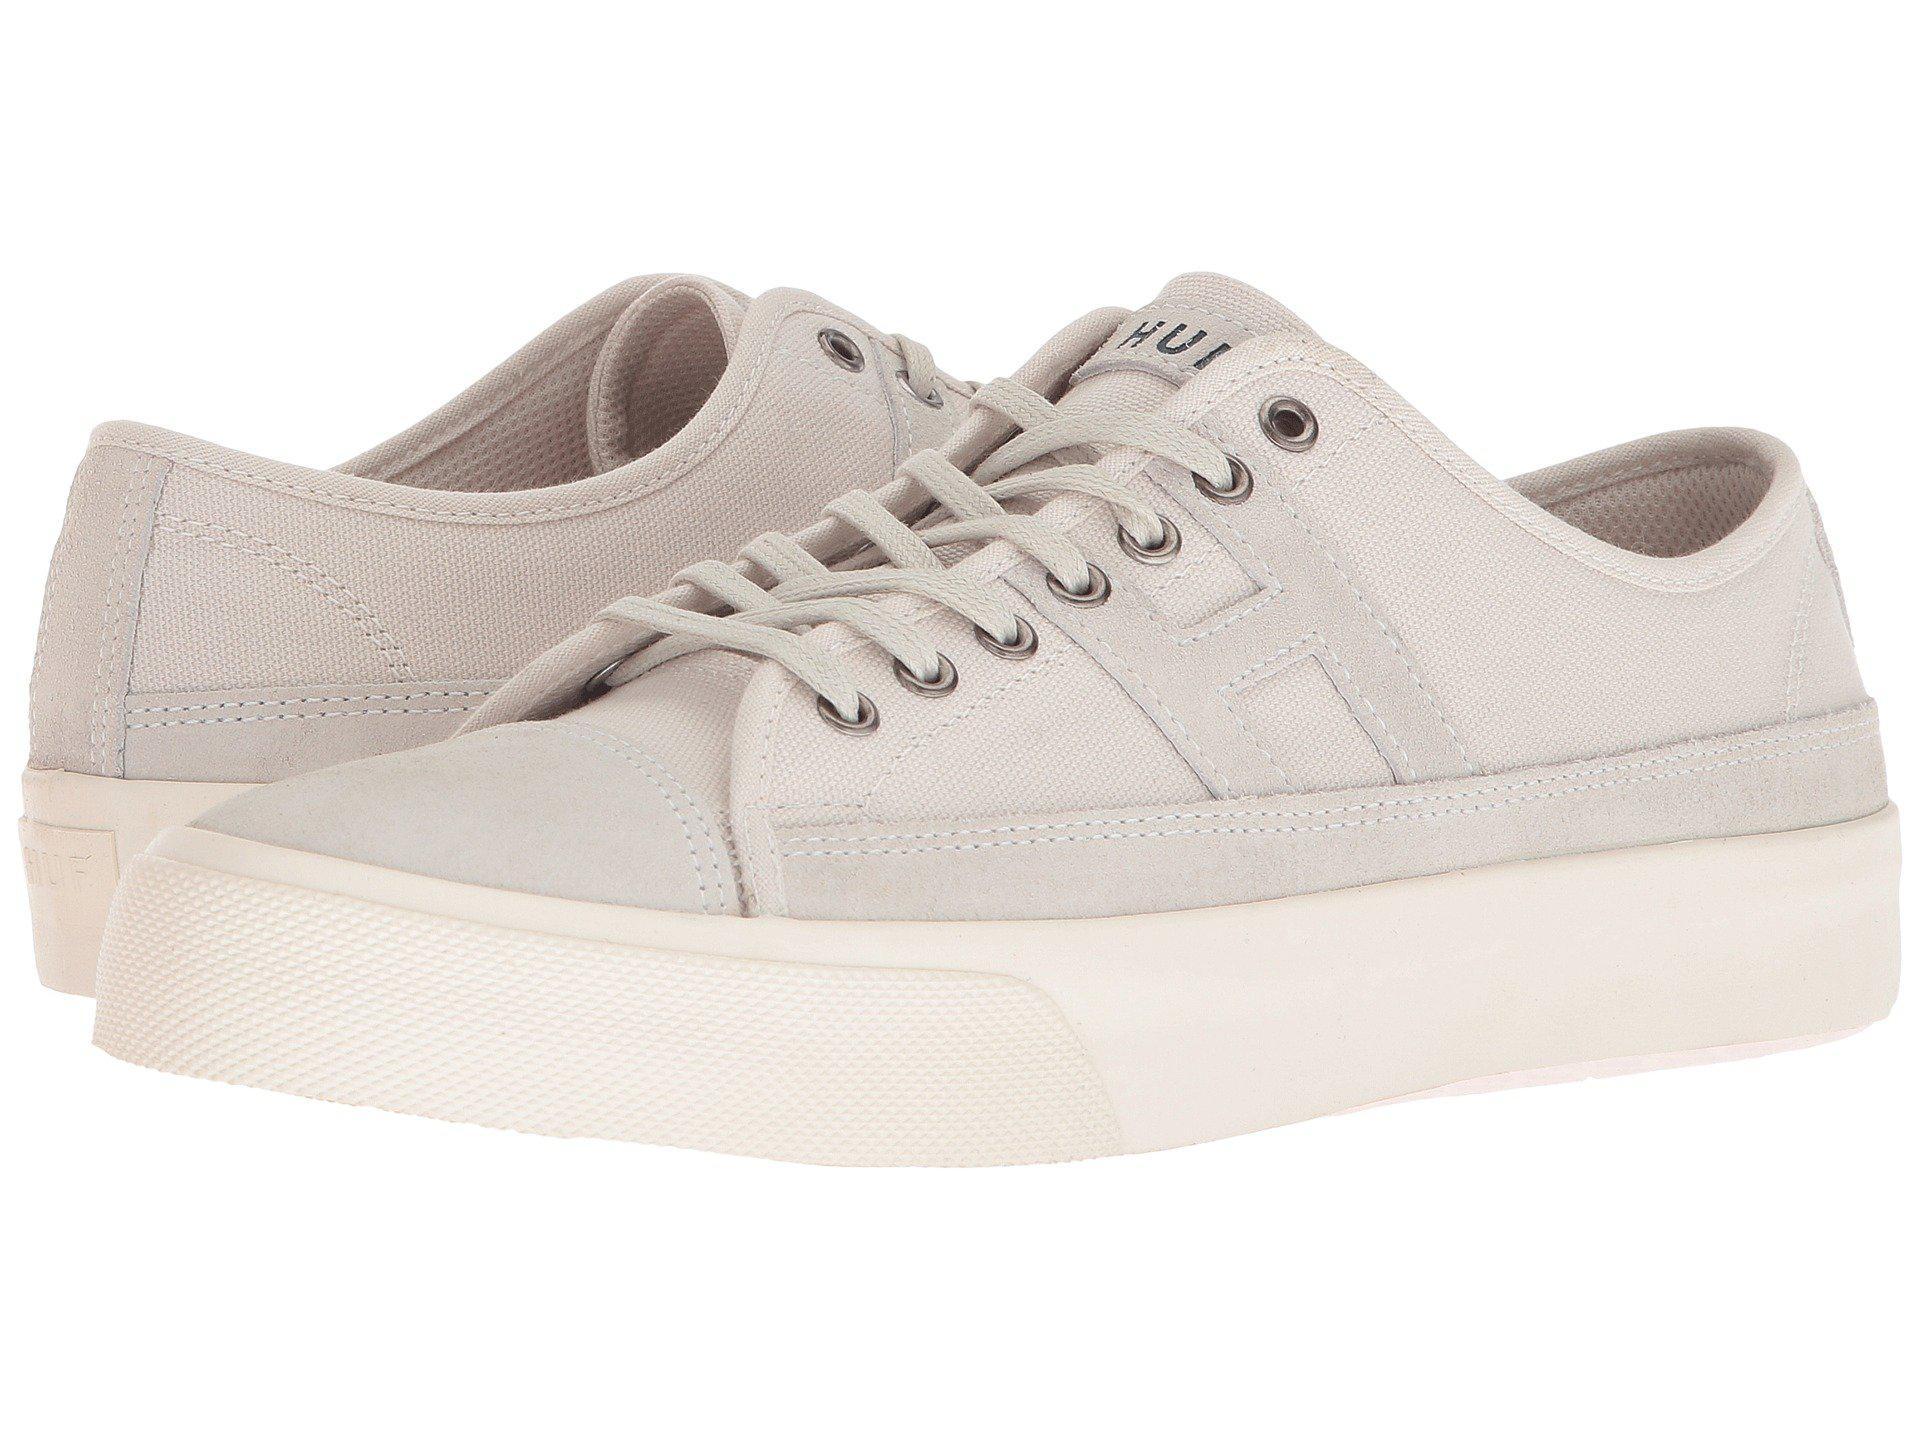 36e16101496d9 huf-NaturalWhite-Hupper-2-Lo-blackblackwhite-Mens-Skate-Shoes.jpeg